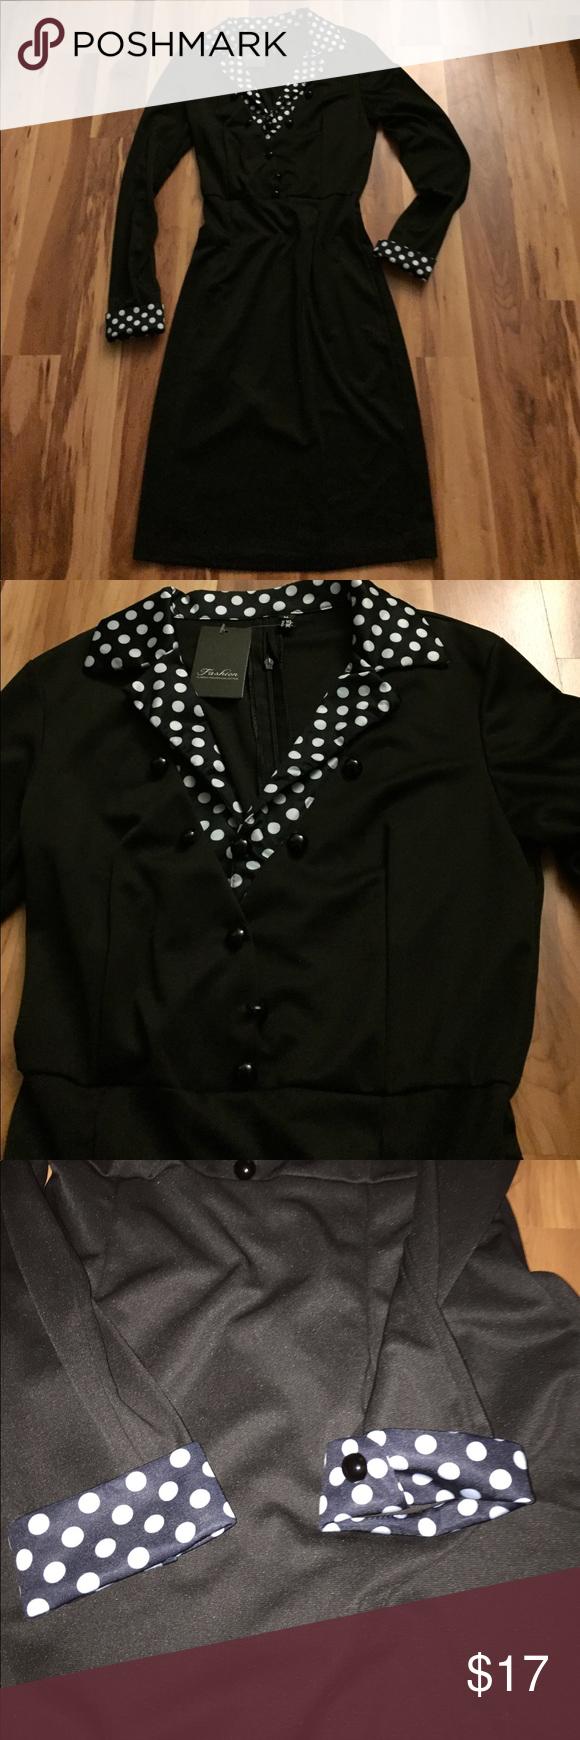 Black dress, new New condition Dresses